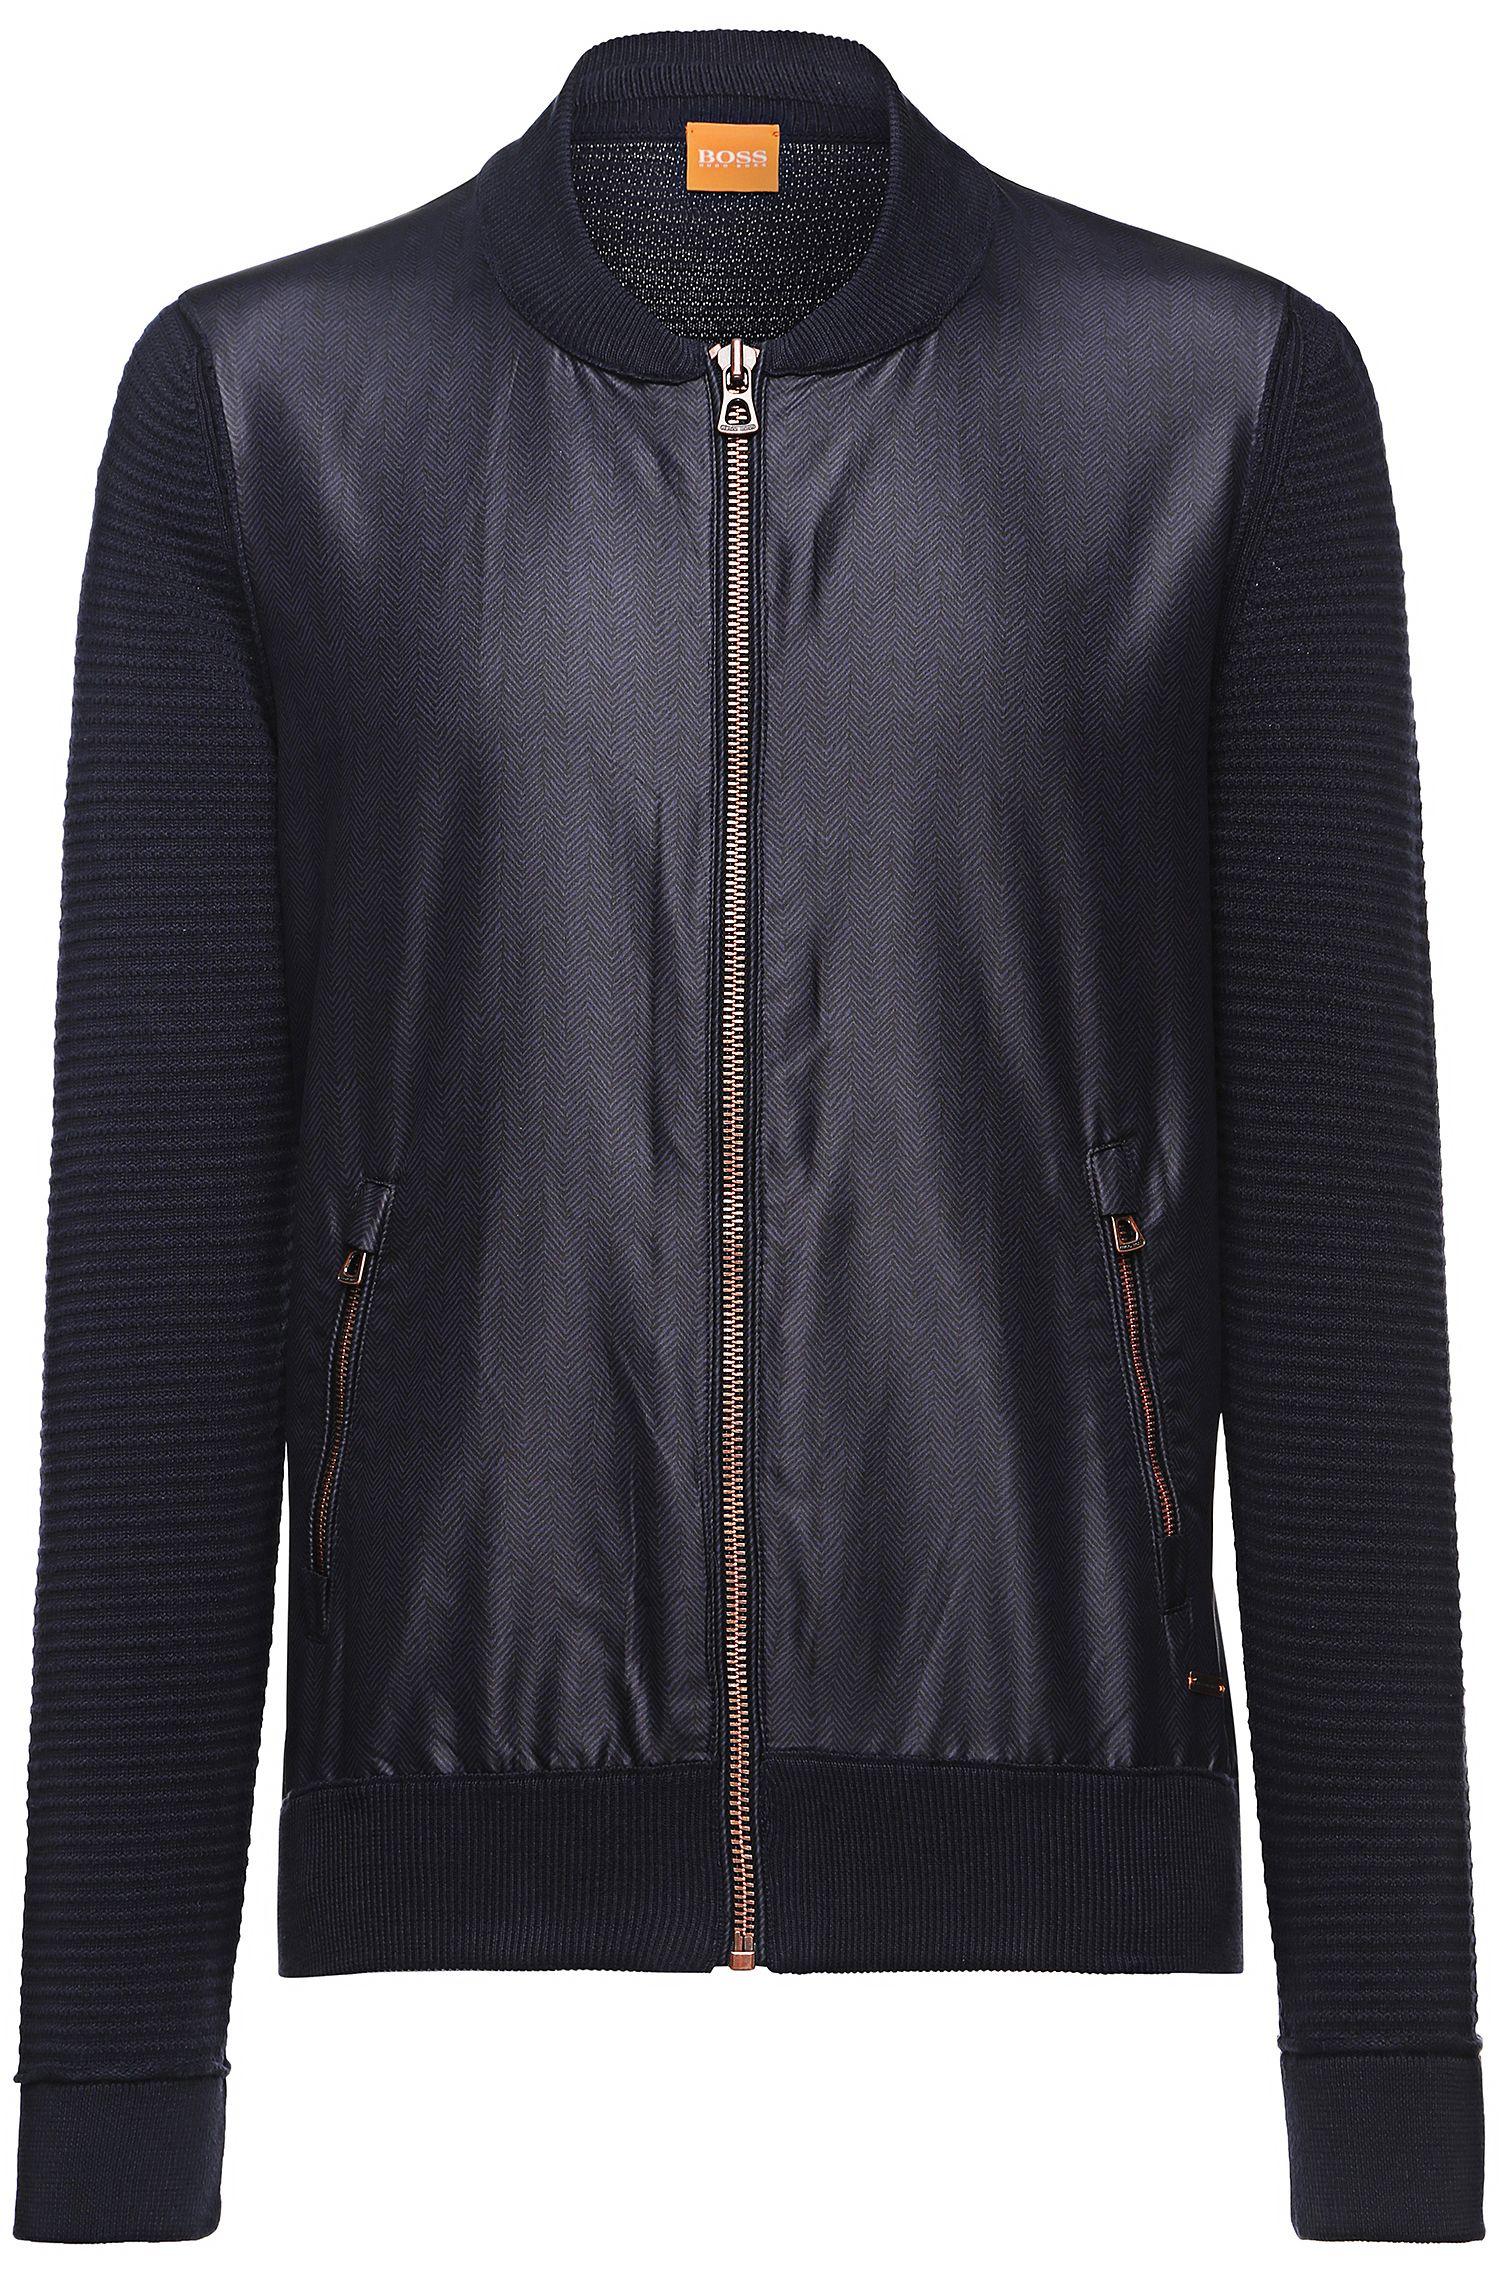 'Abomberny' | Cotton Knit Sleeve Bomber Jacket